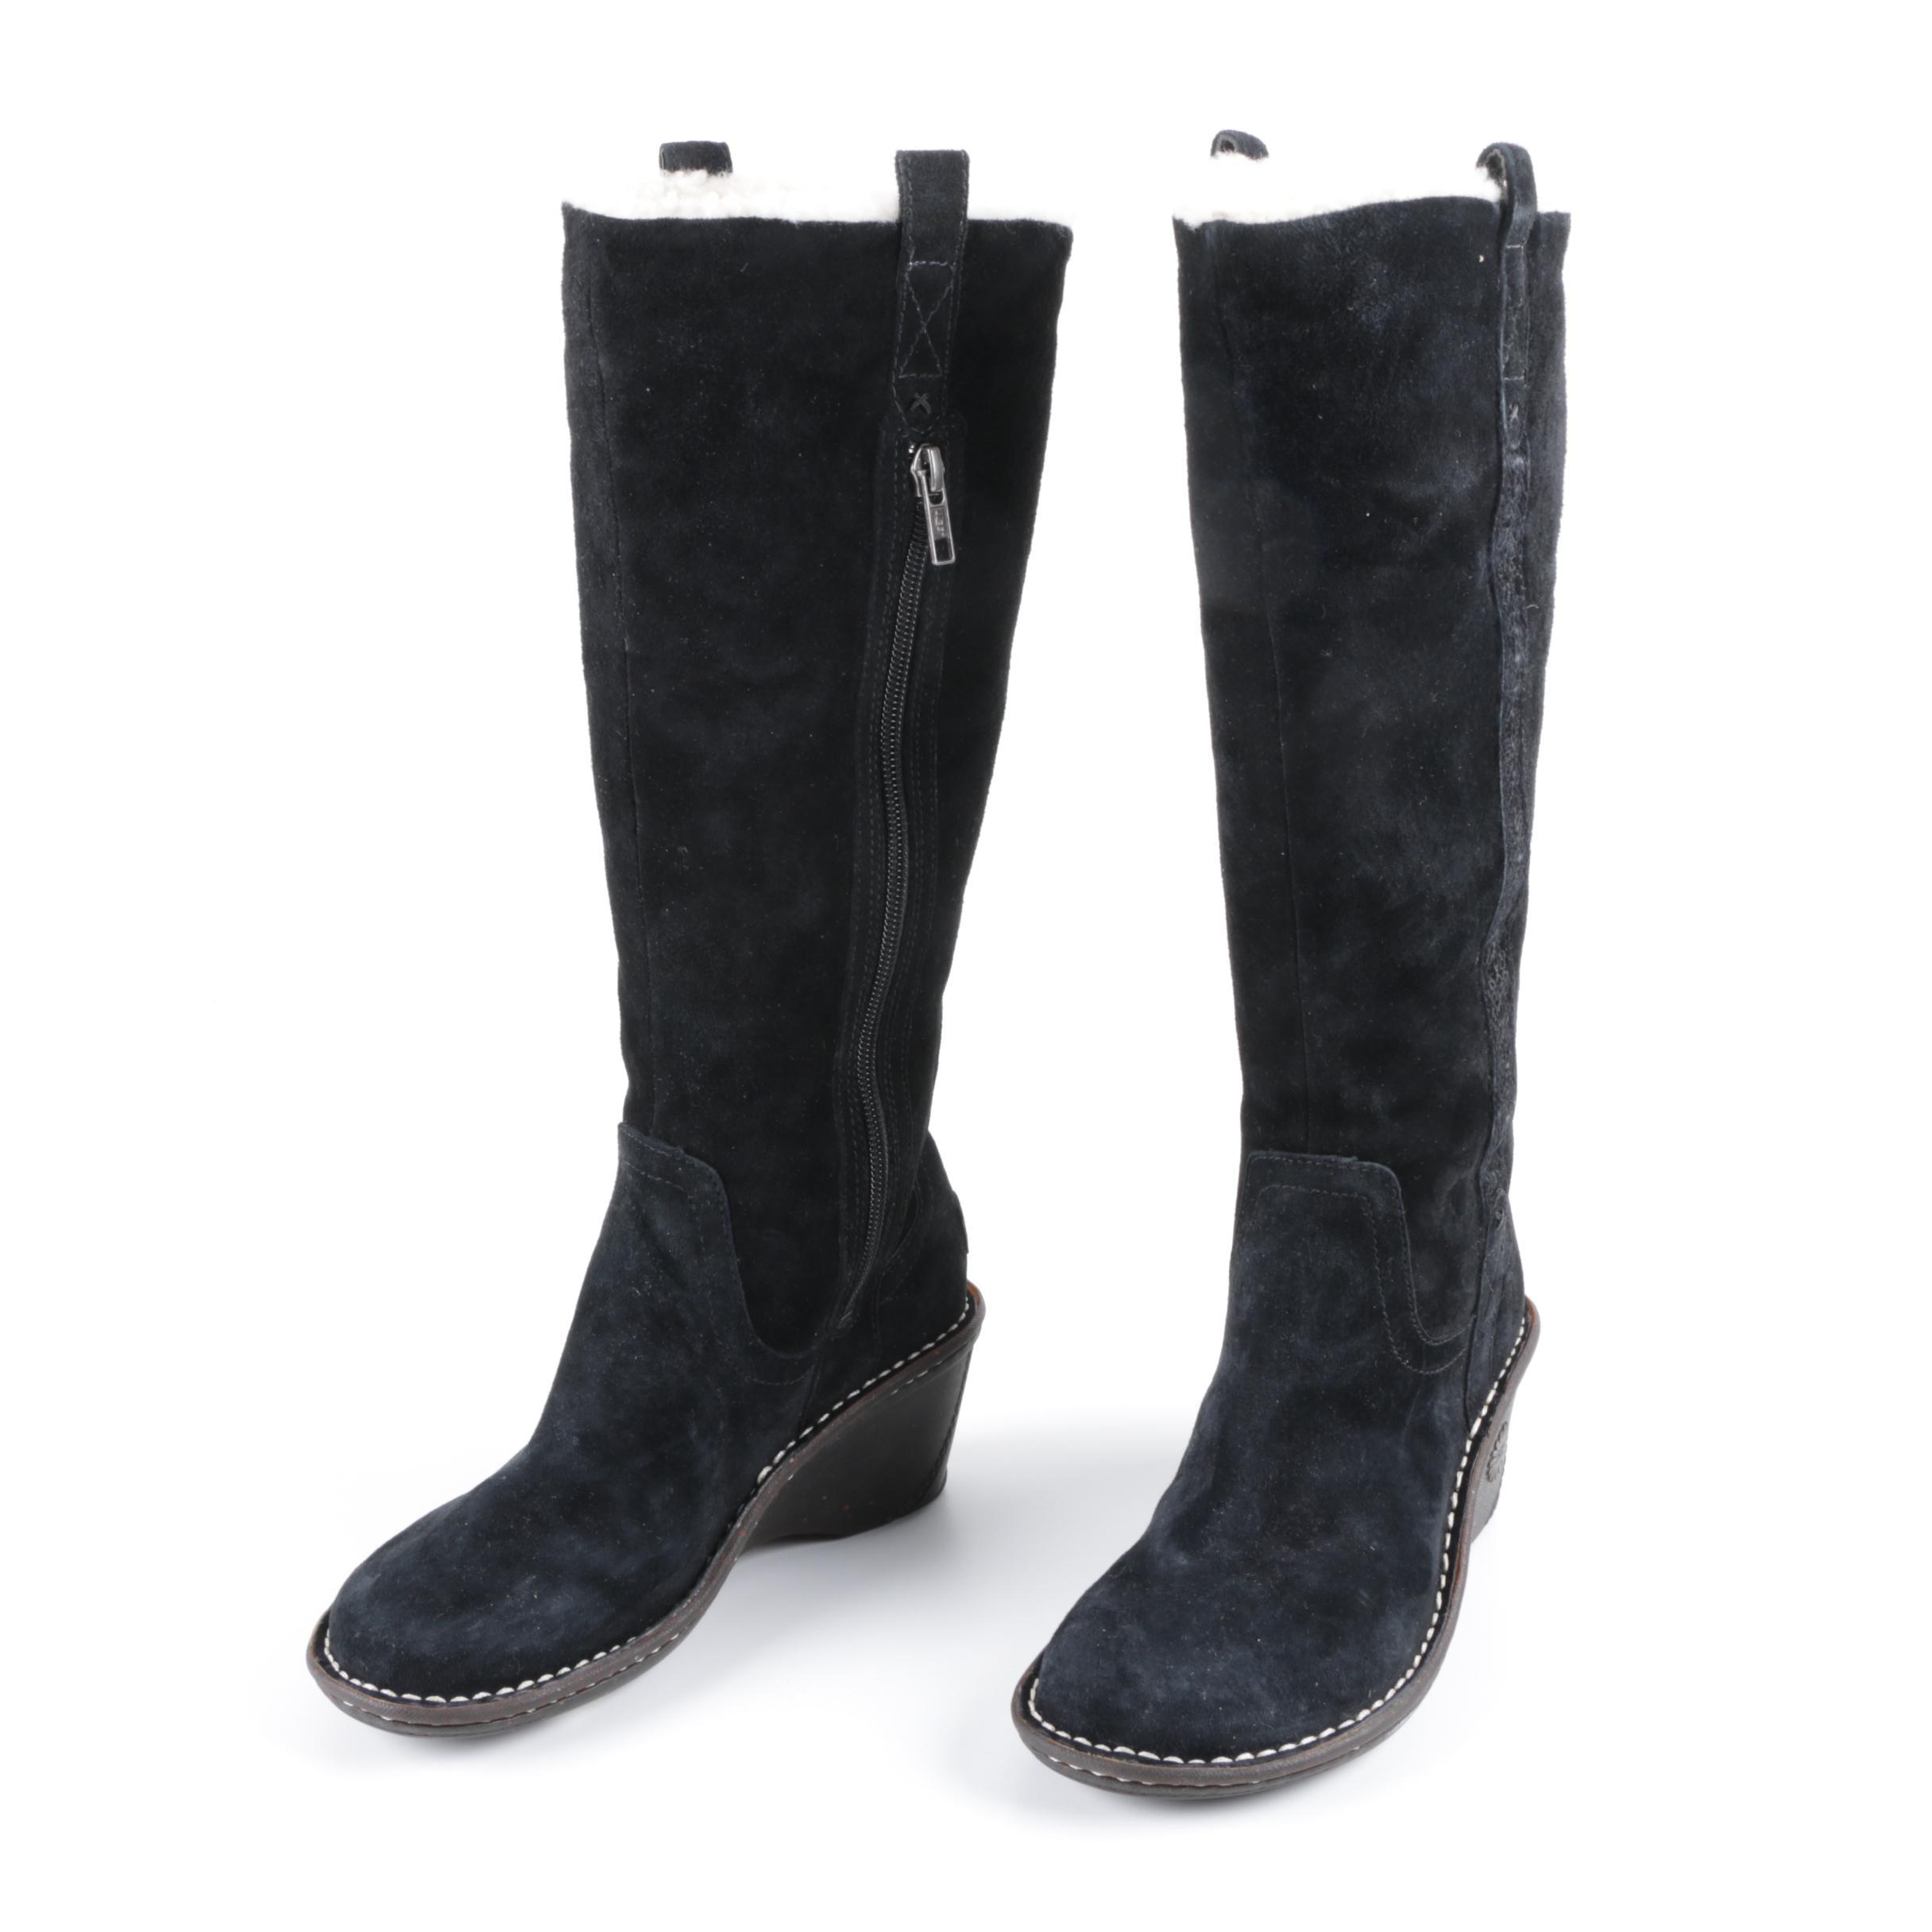 Ugg Australia Soleil Black Suede Wedge Boots